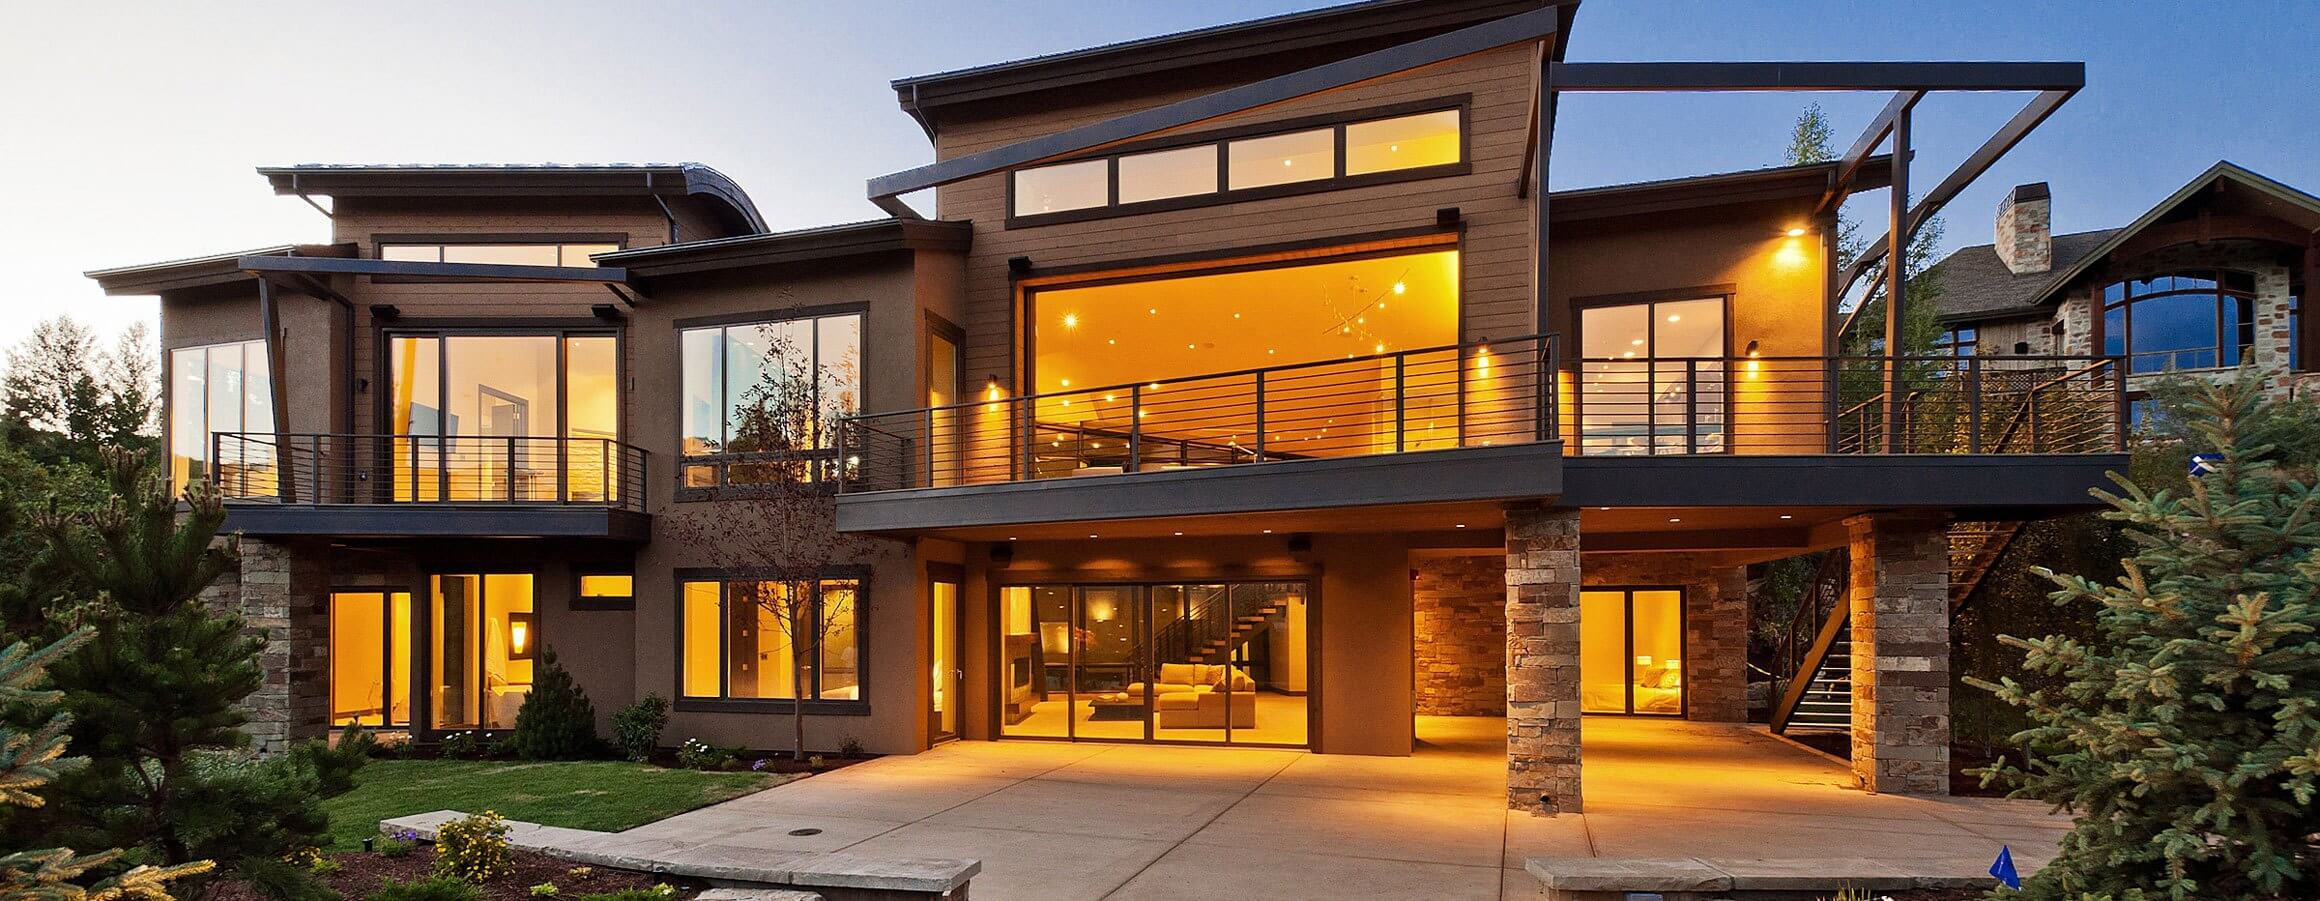 Energy efficient lighting - Green Home Renovations